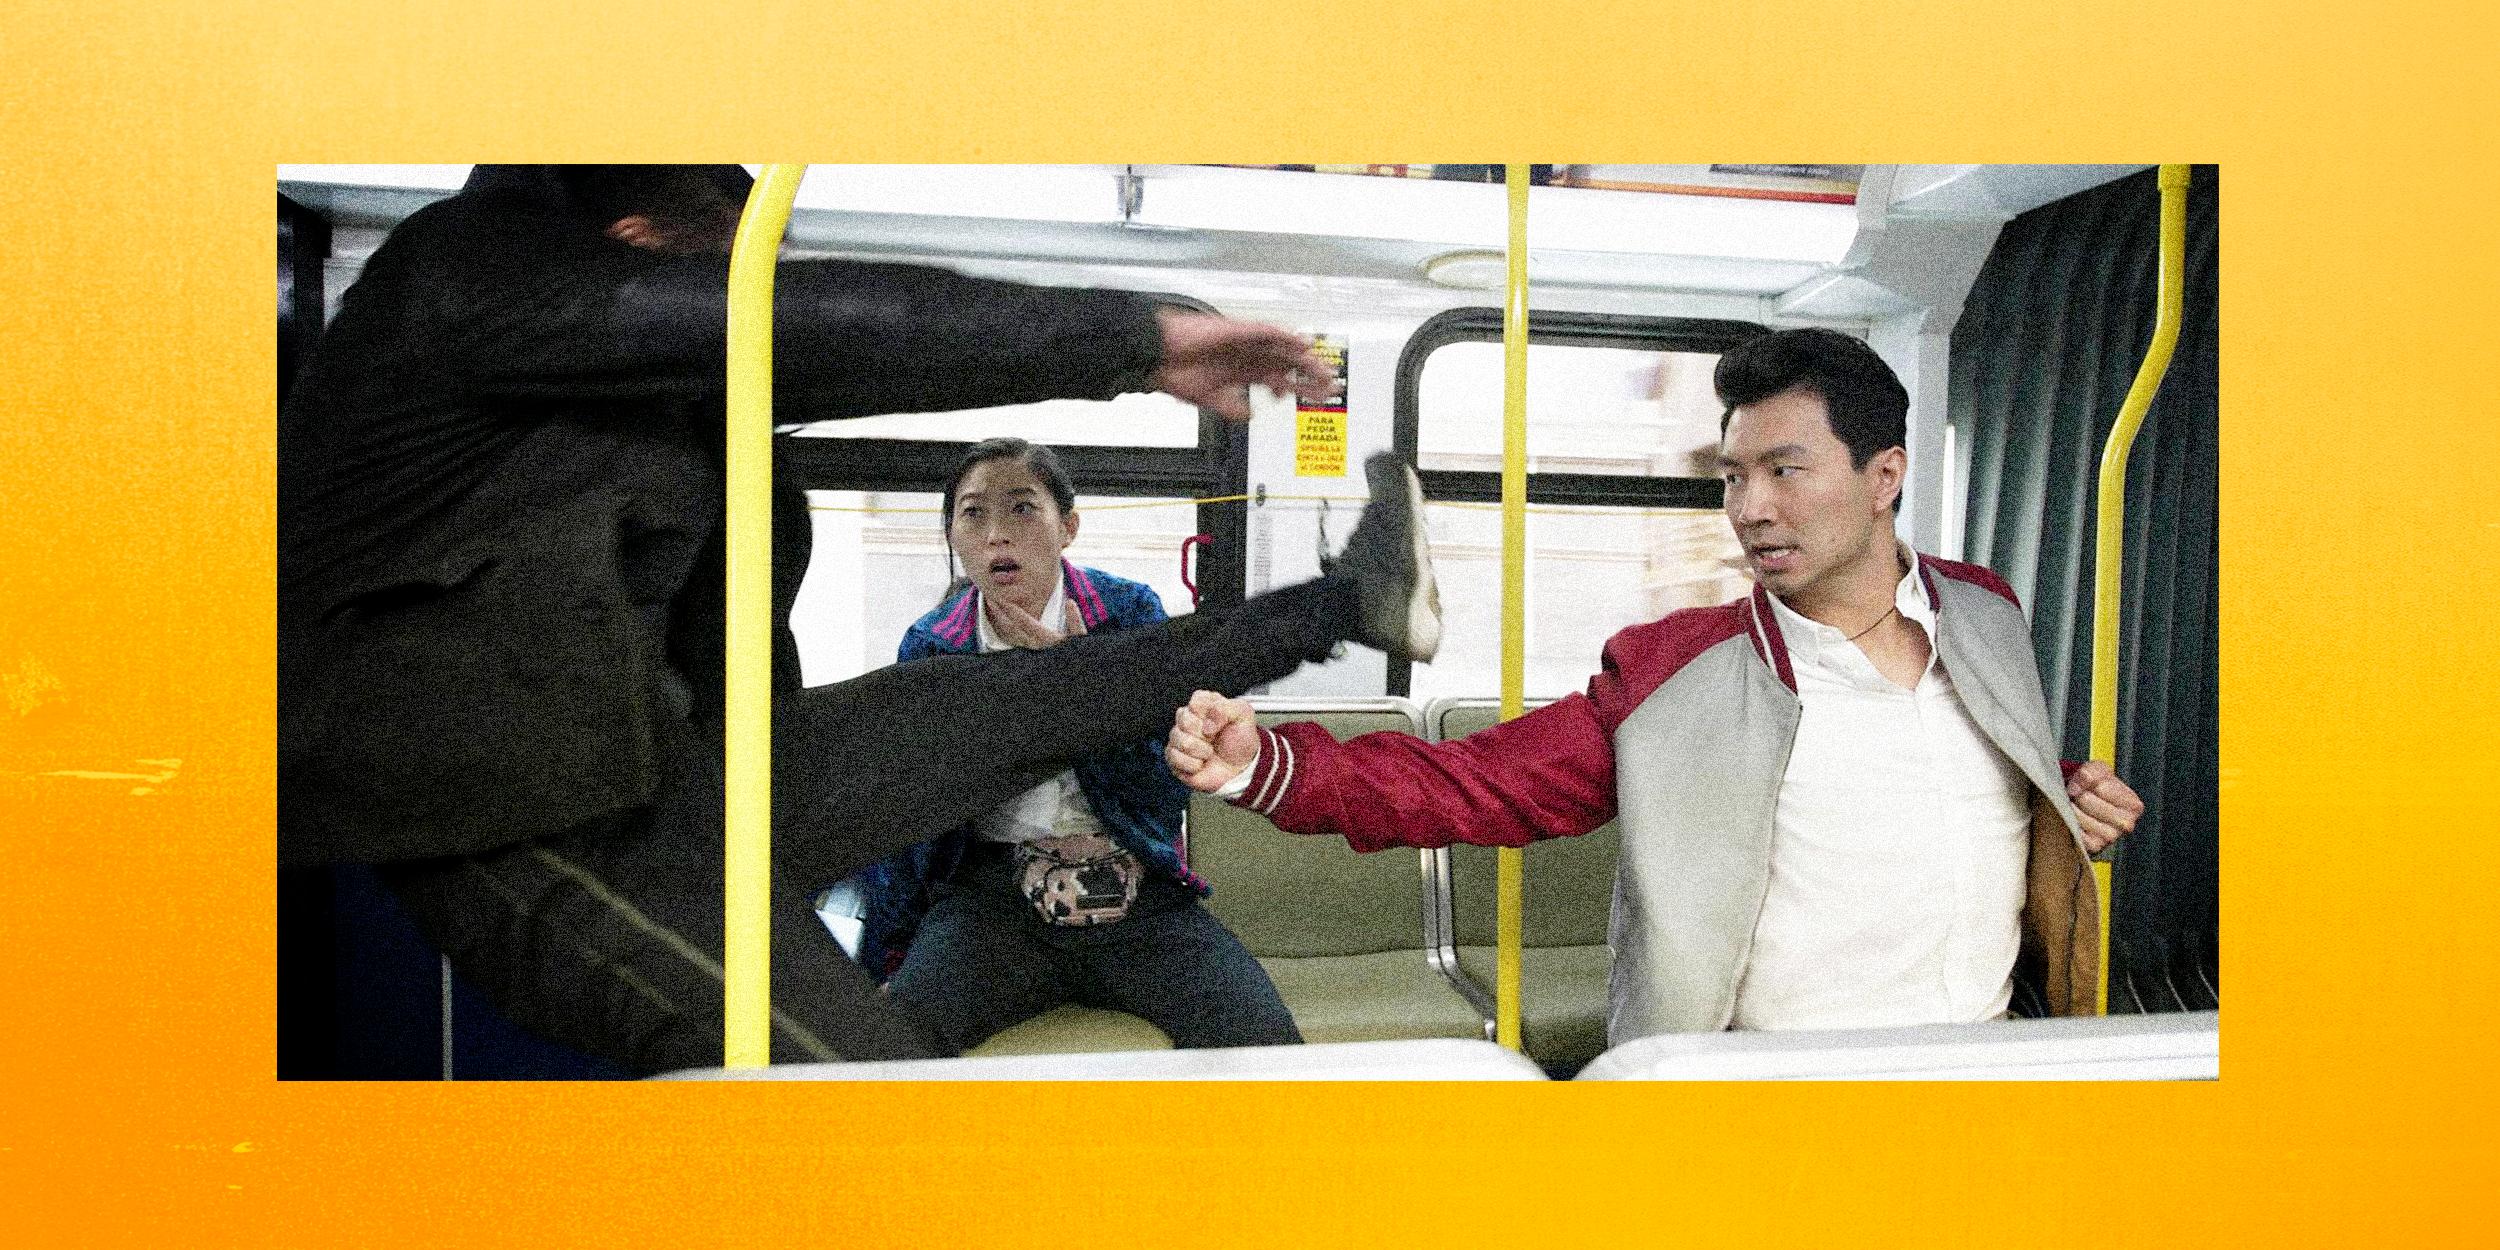 How Marvel's new hero flick poignantly captures common themes among Asian diaspora